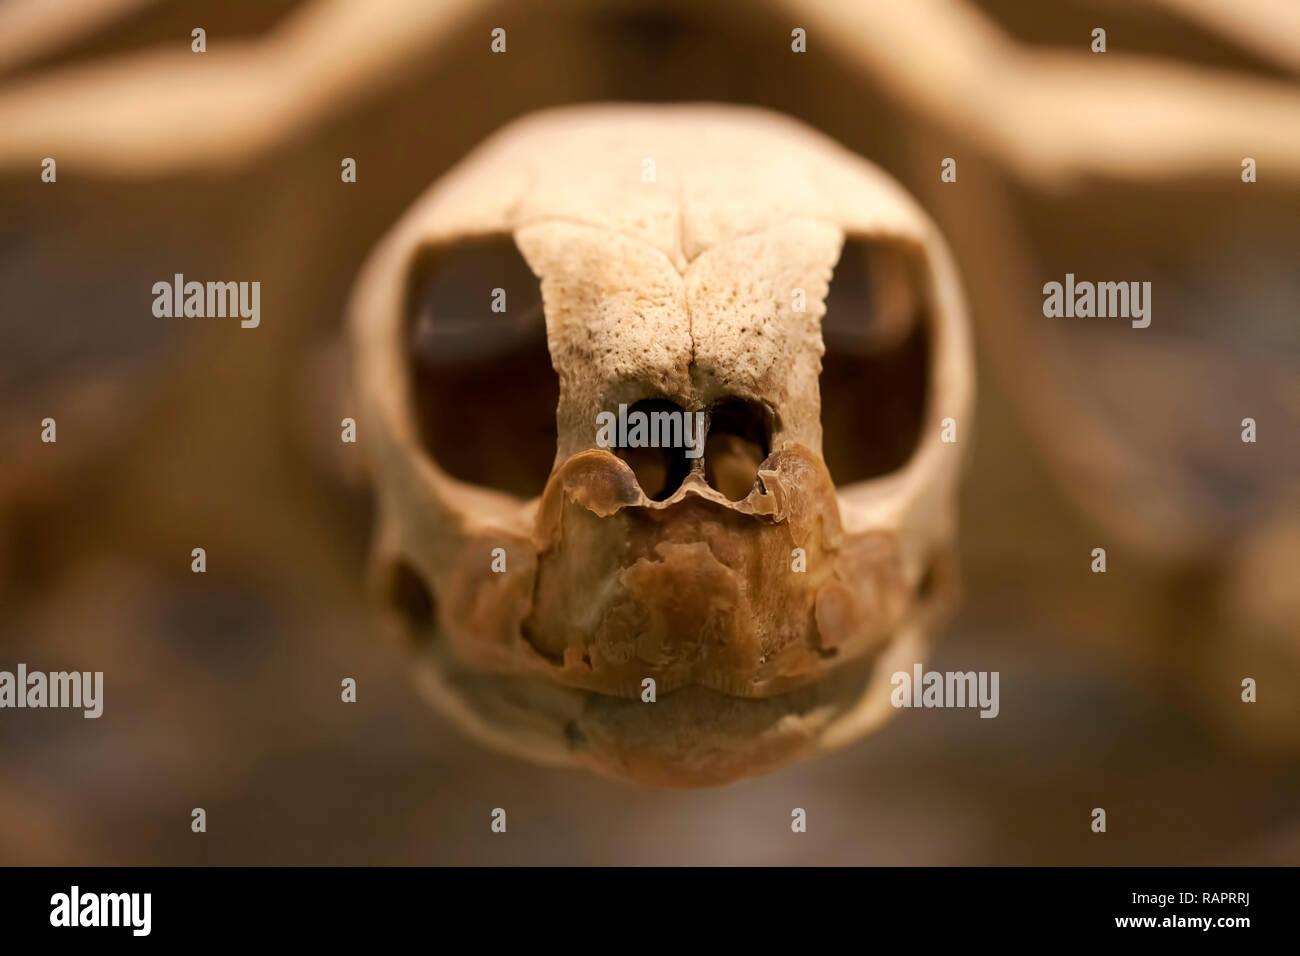 Prehistoric Ancient Animal Turtle Skeleton  Fossil Photo - Stock Image